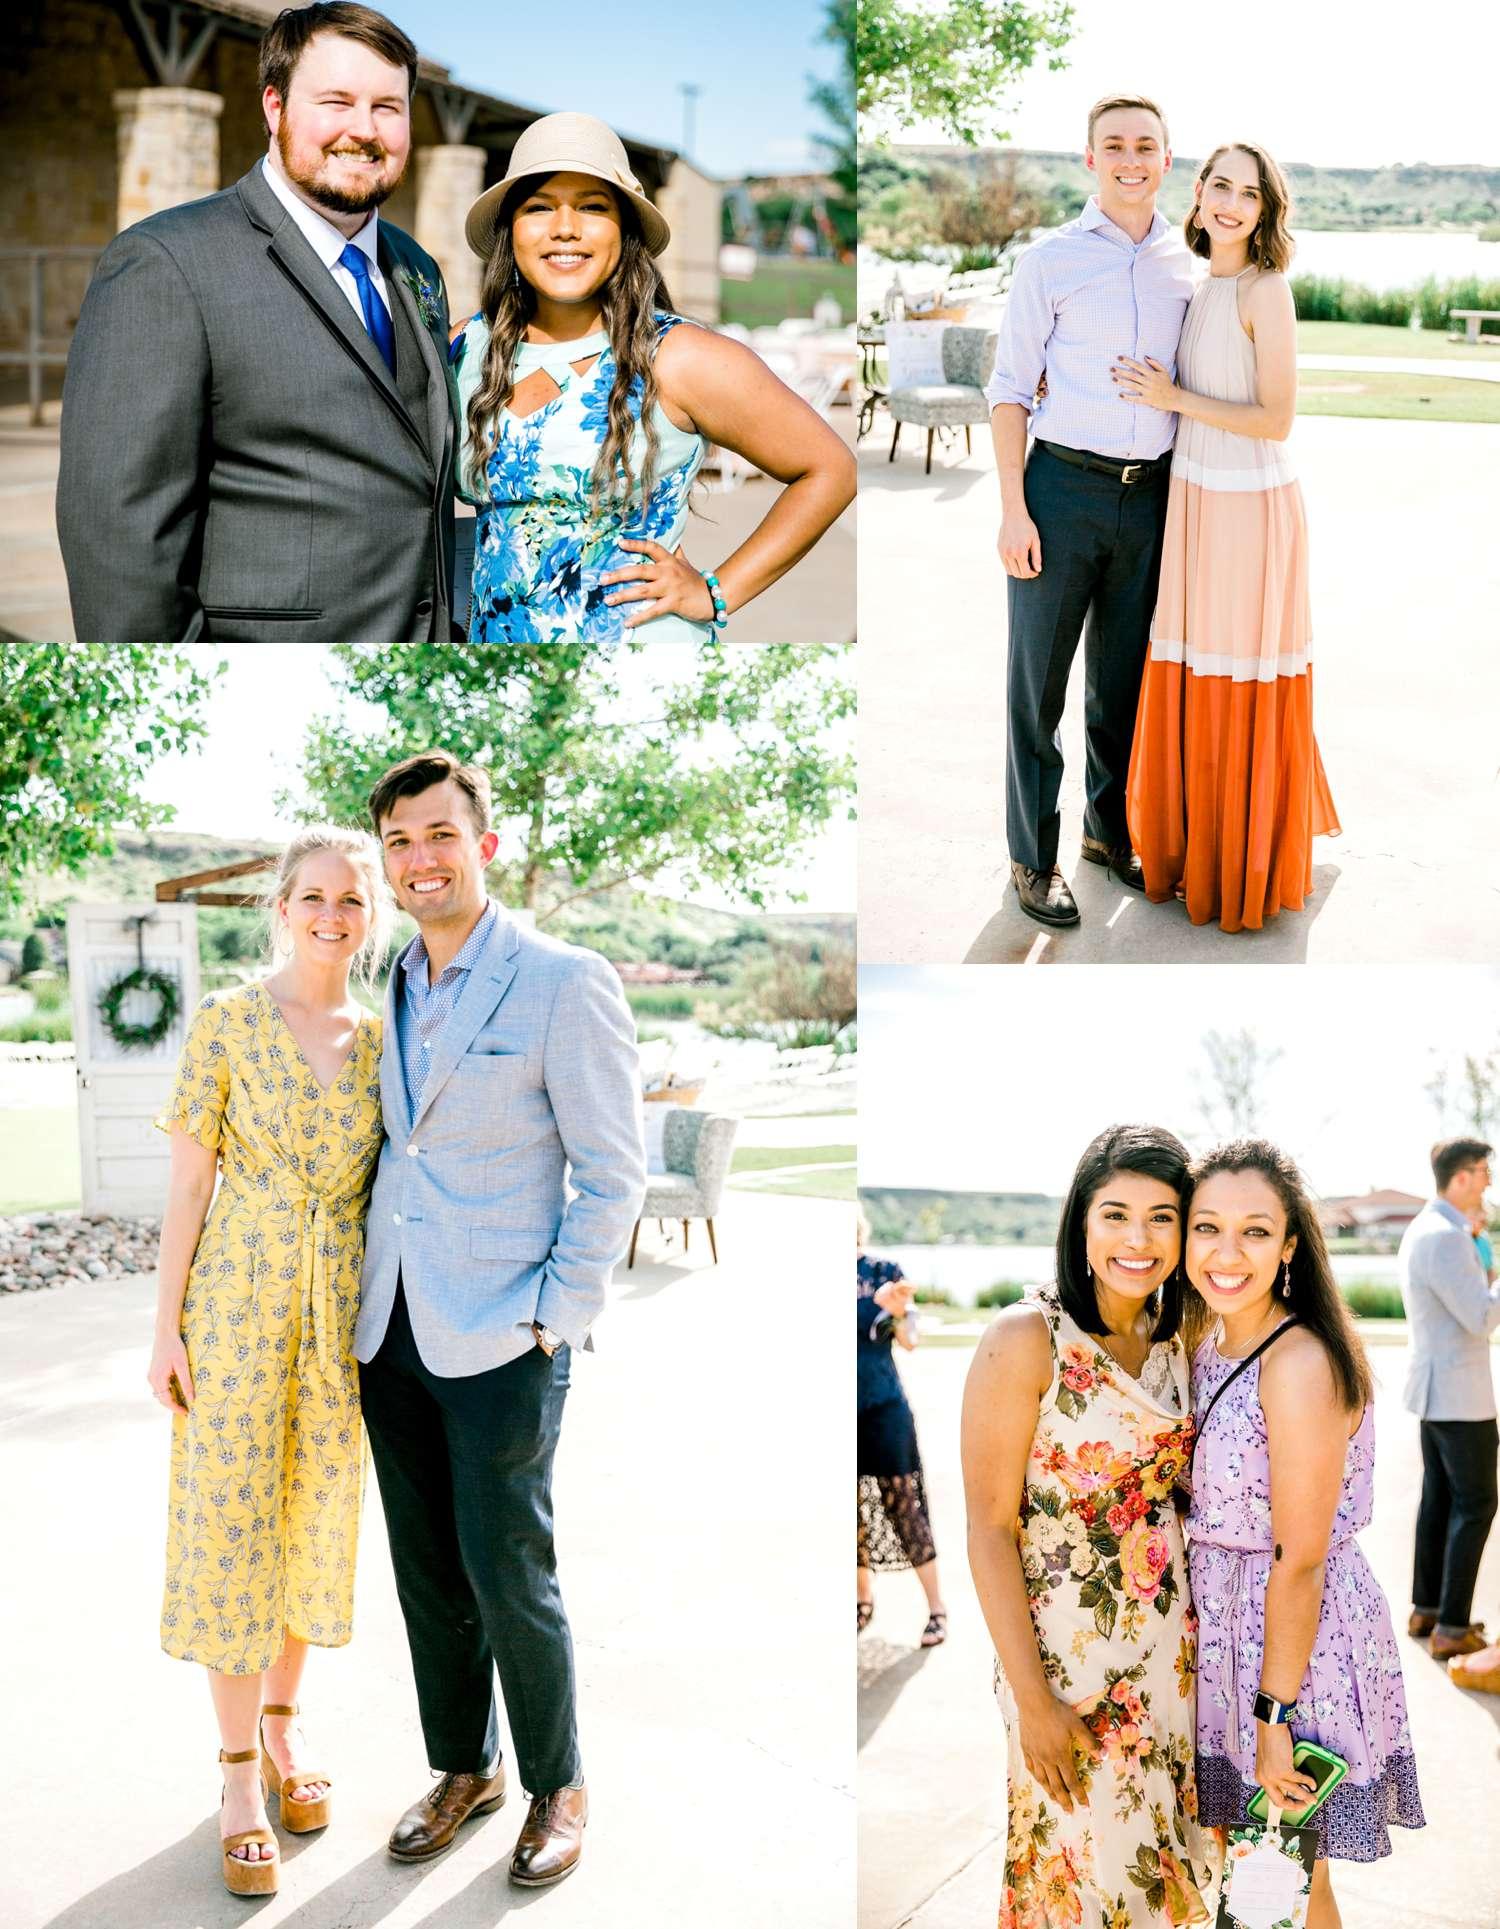 TY+NATHAN+HALLIER+ALLEEJ+WEDDING+PHOTOGRAPHER+RANSOM+CANYON_0093.jpg